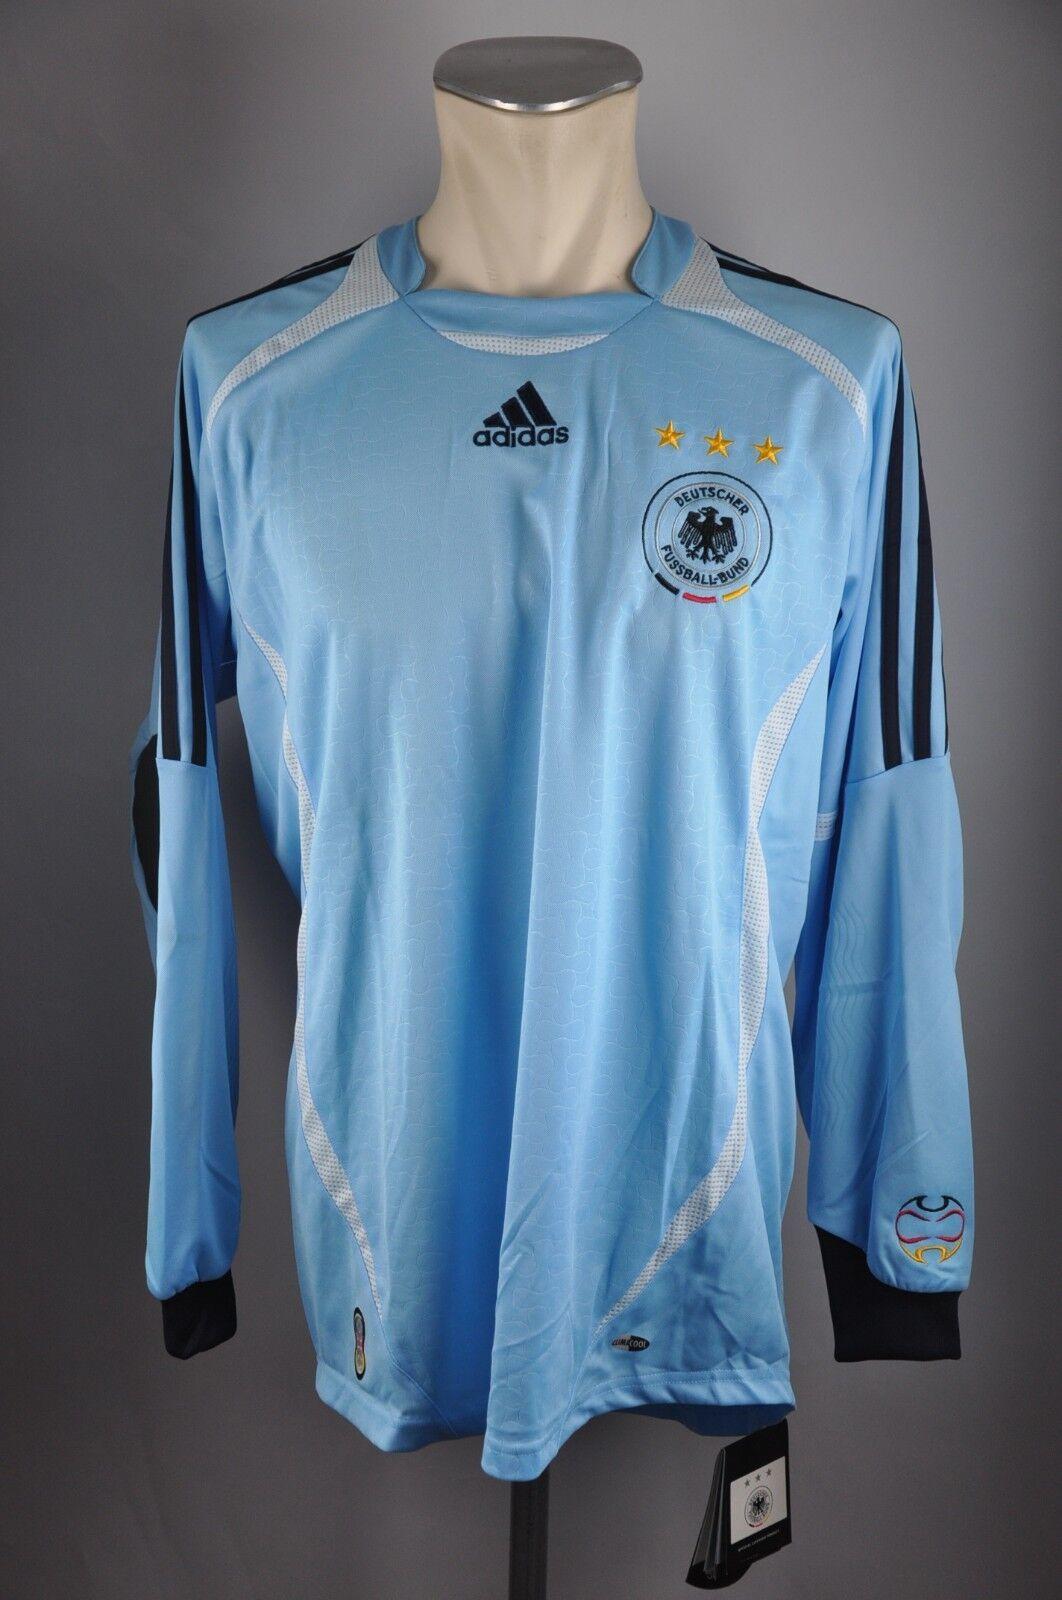 Deutschland Trikot Gr. M Adidas Jersey 2006 WM Torwart DFB Germany blau EM